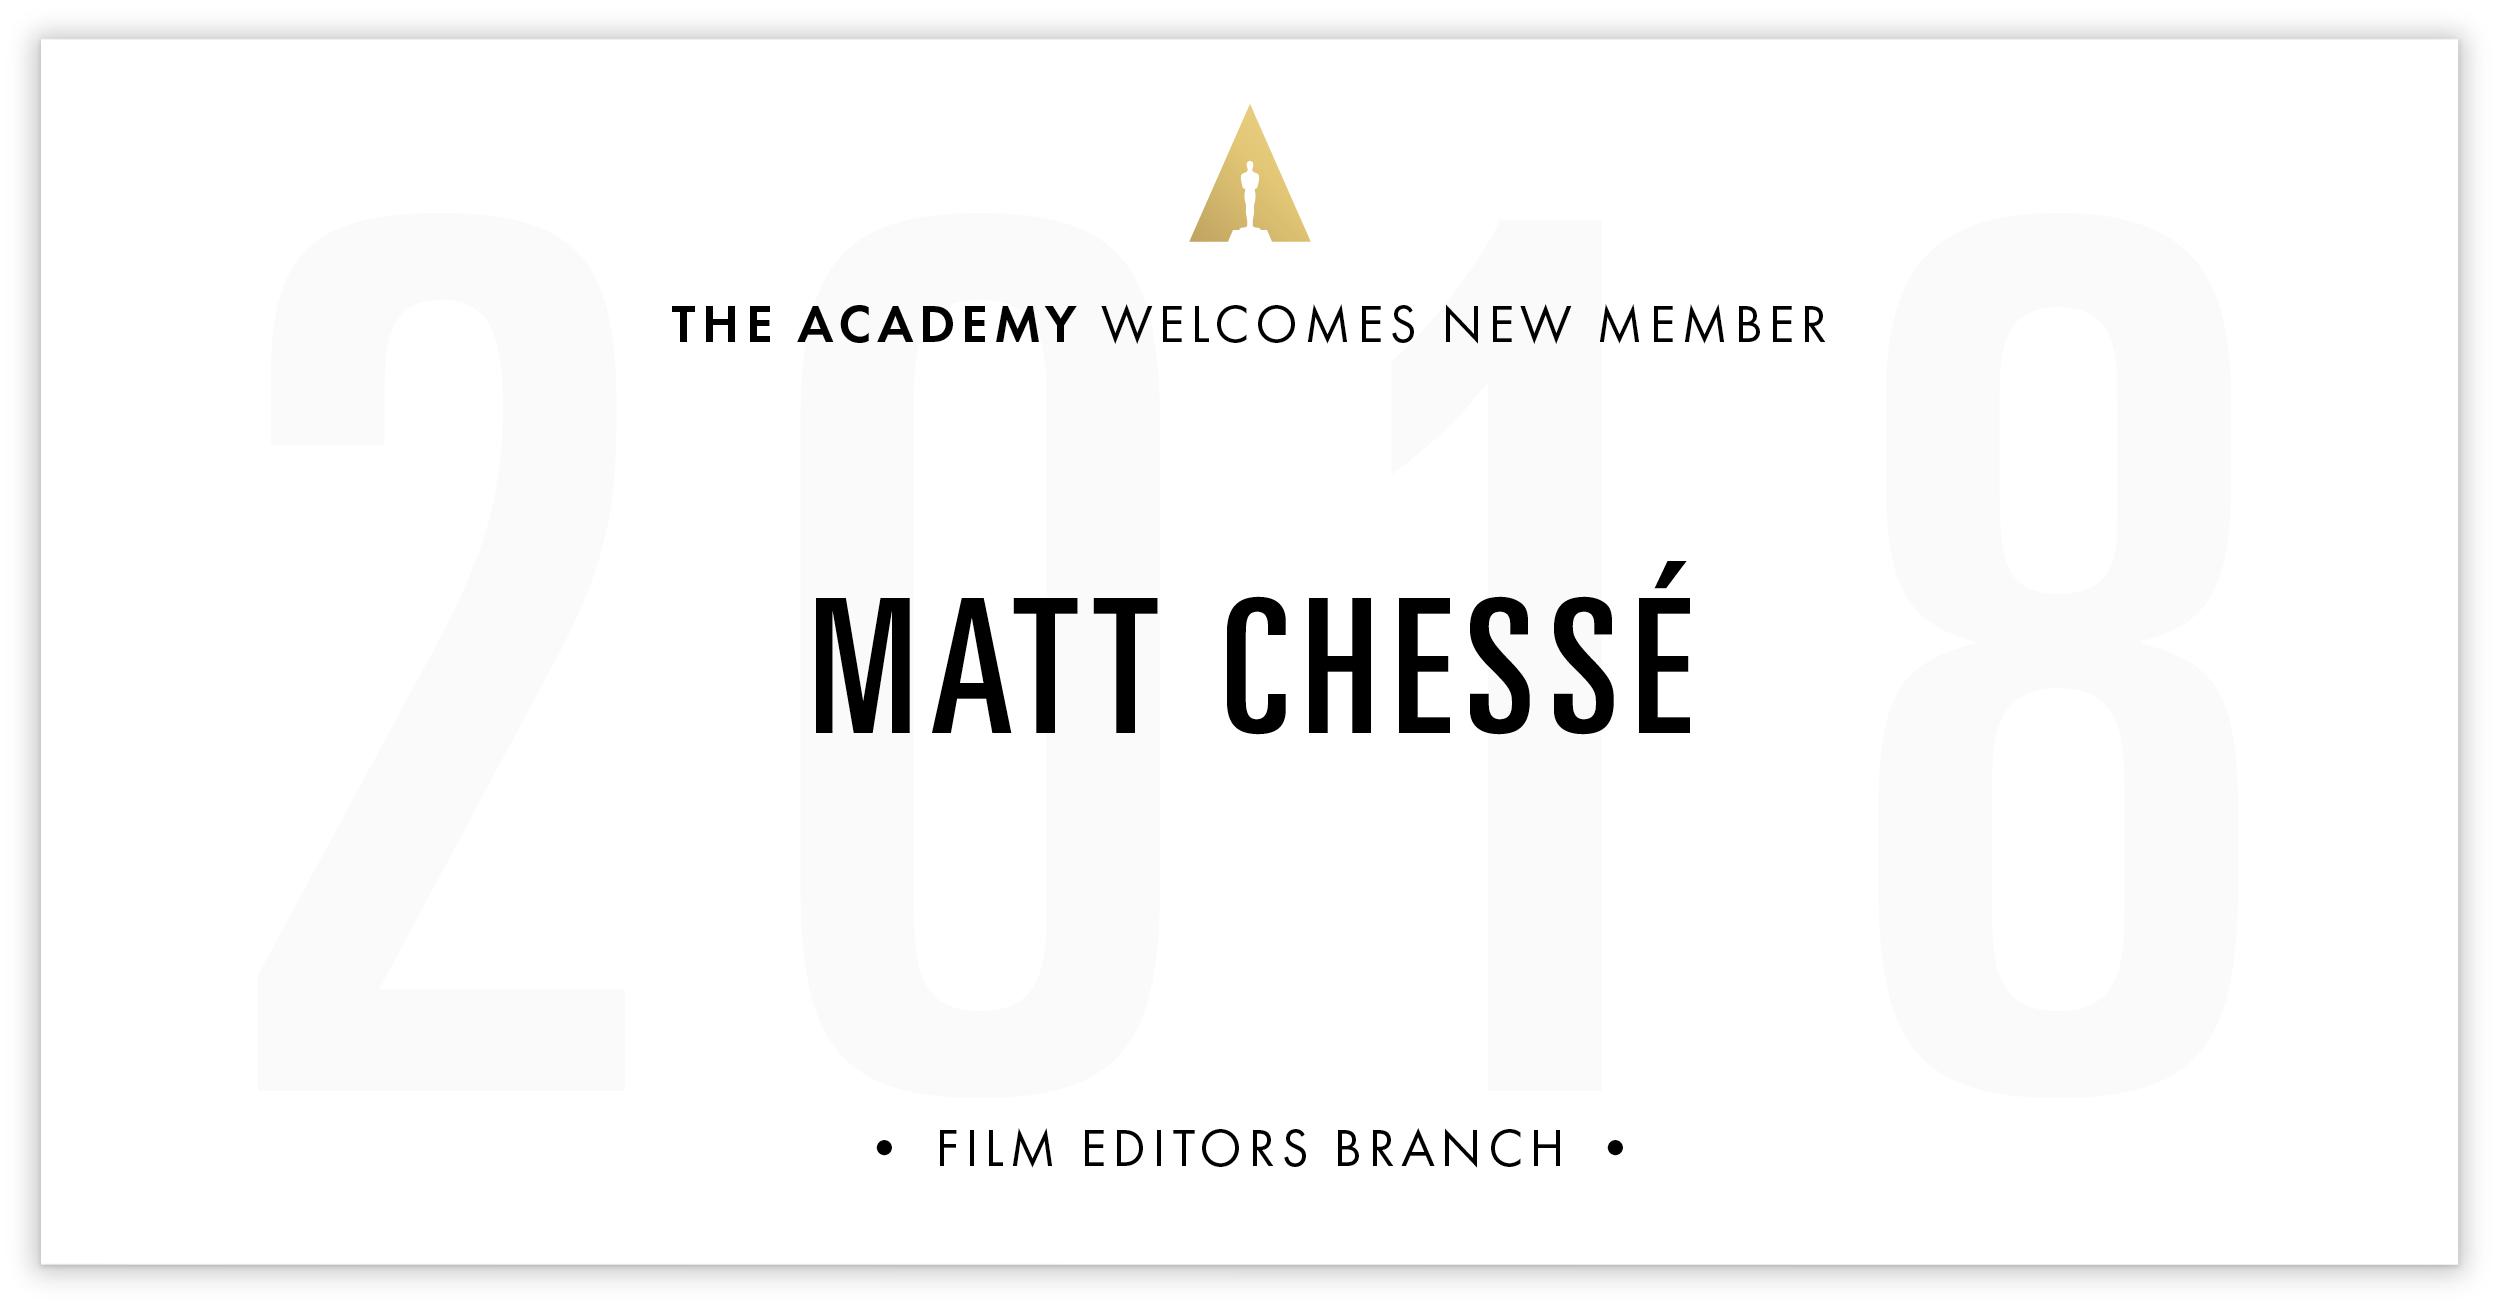 Matt Chessé is invited!